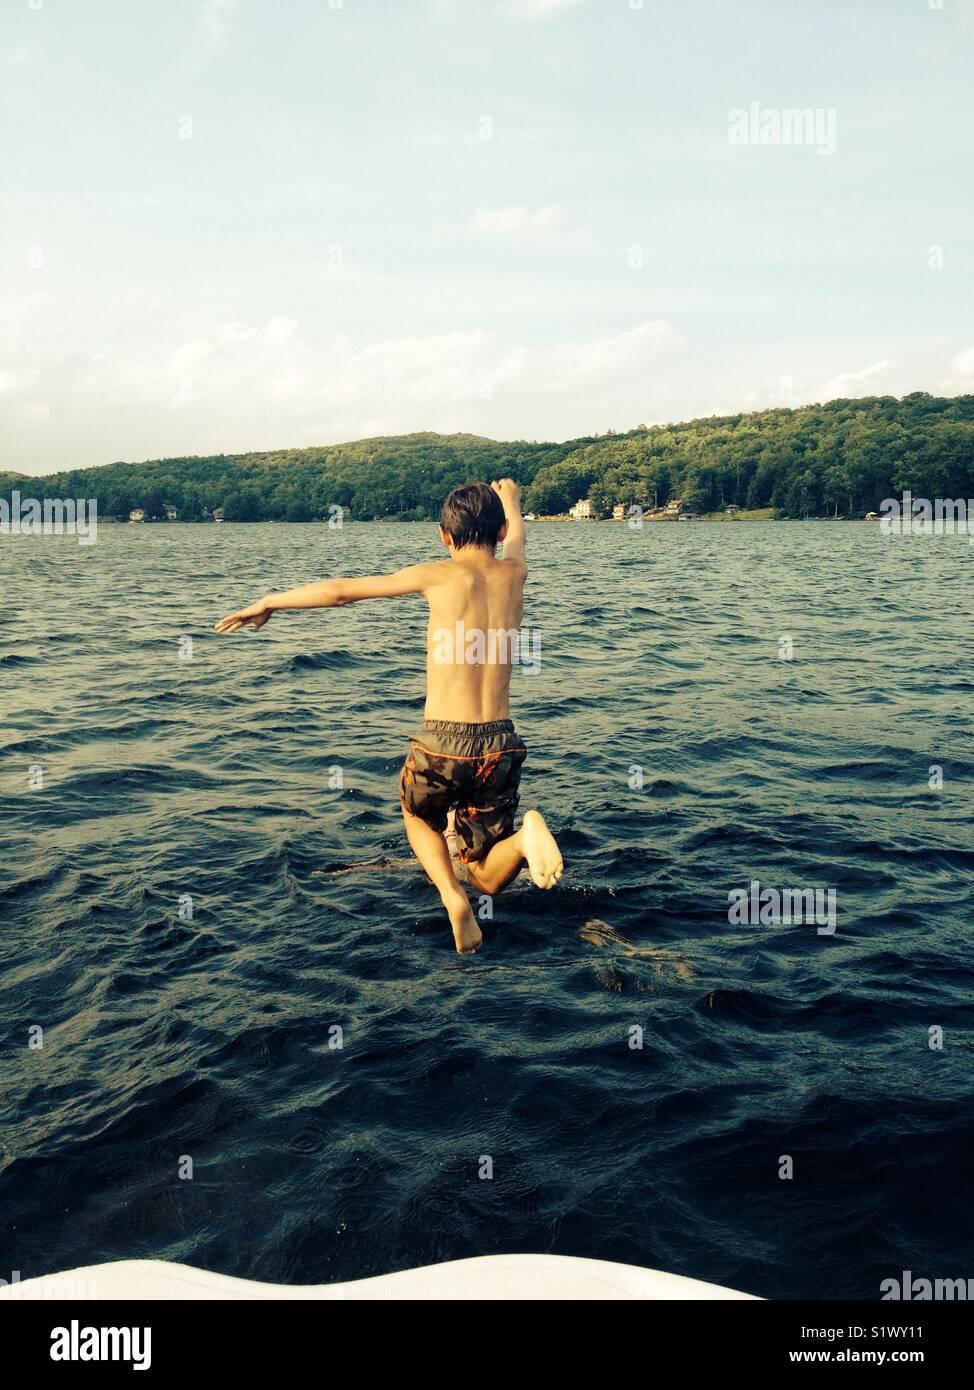 Zambullirse en un lago Imagen De Stock